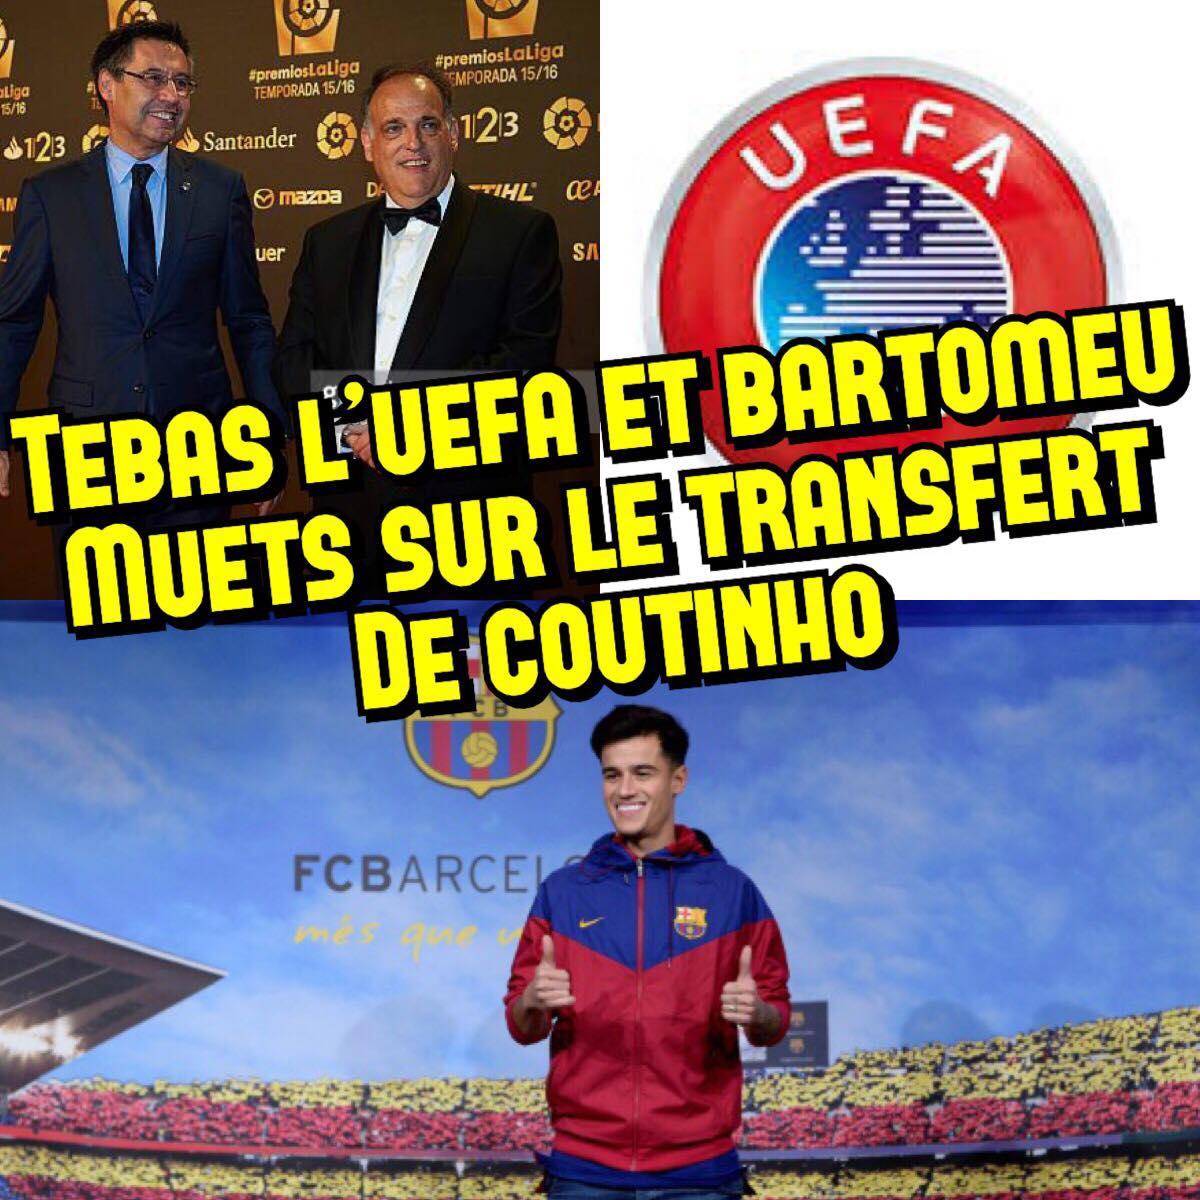 Javier Tebas PSG Bartomeu UEFA